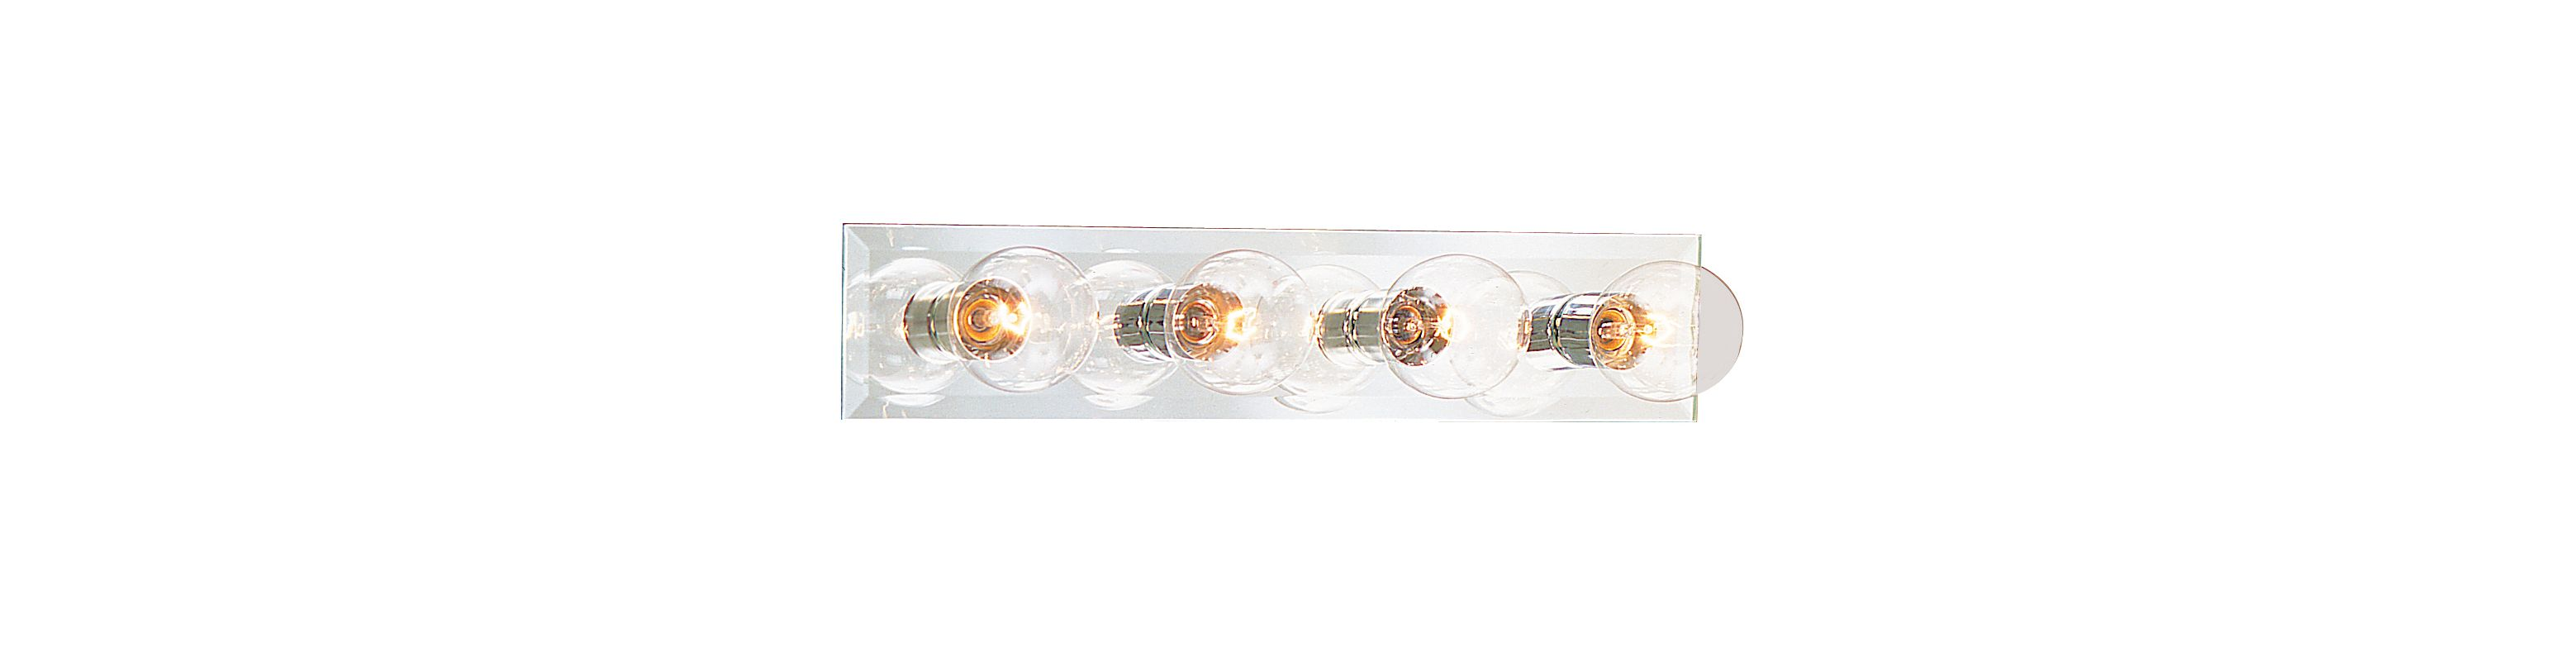 "Thomas Lighting SL7324 Functional 4 Light 24.75"" Wide Bathroom Fixture"